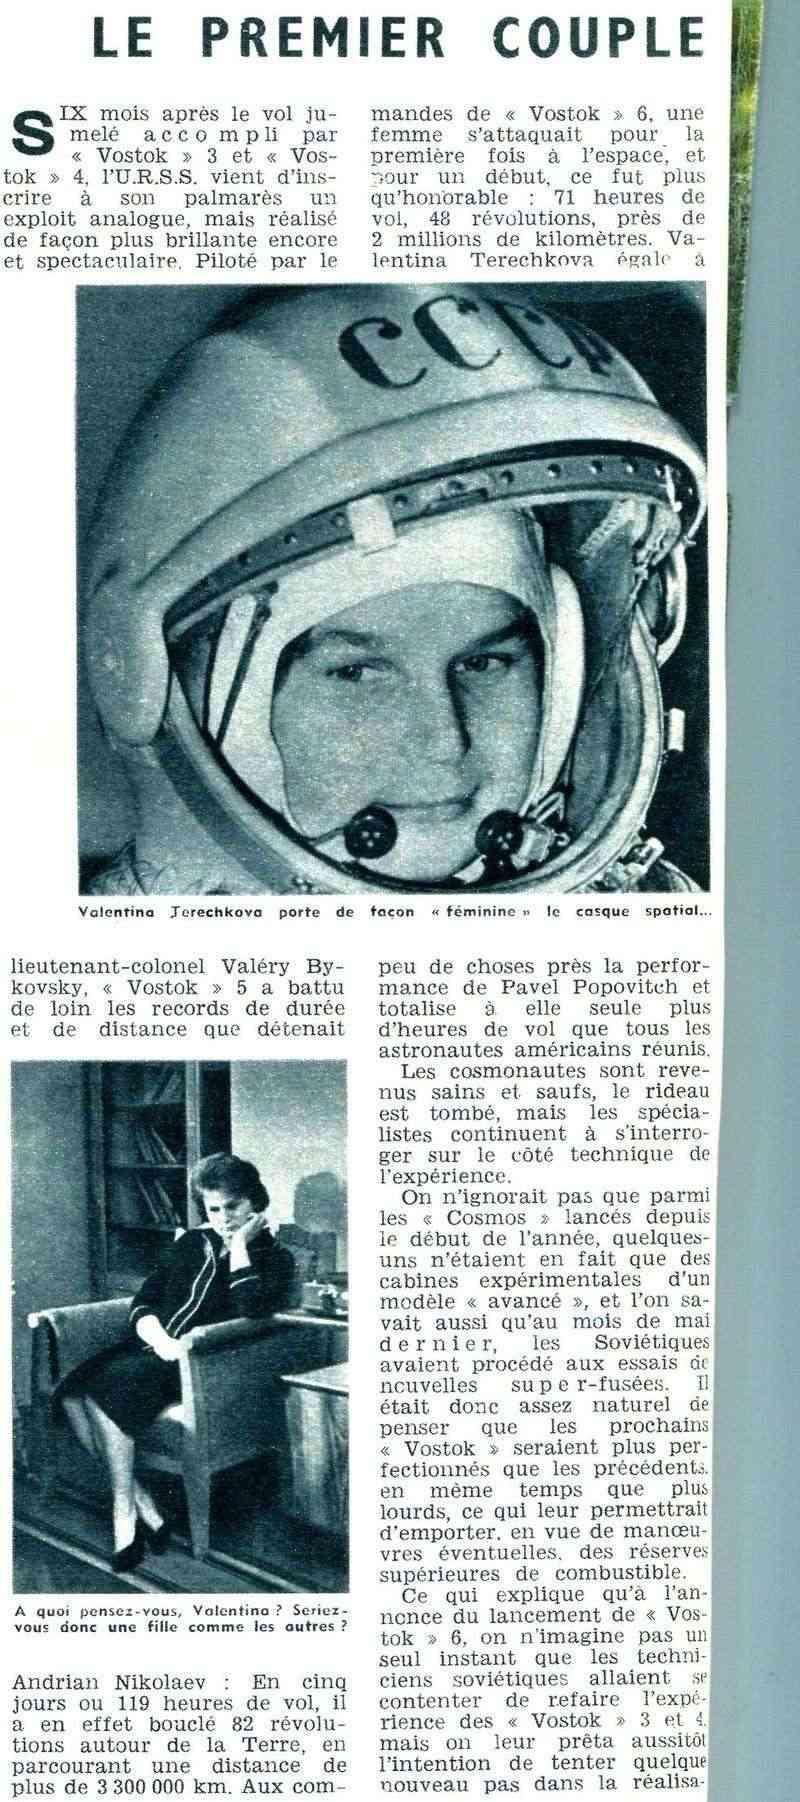 Vostok 5, Vostok 6 - 14, 16 juin 1963 - 1ers vols conjoints 63070110